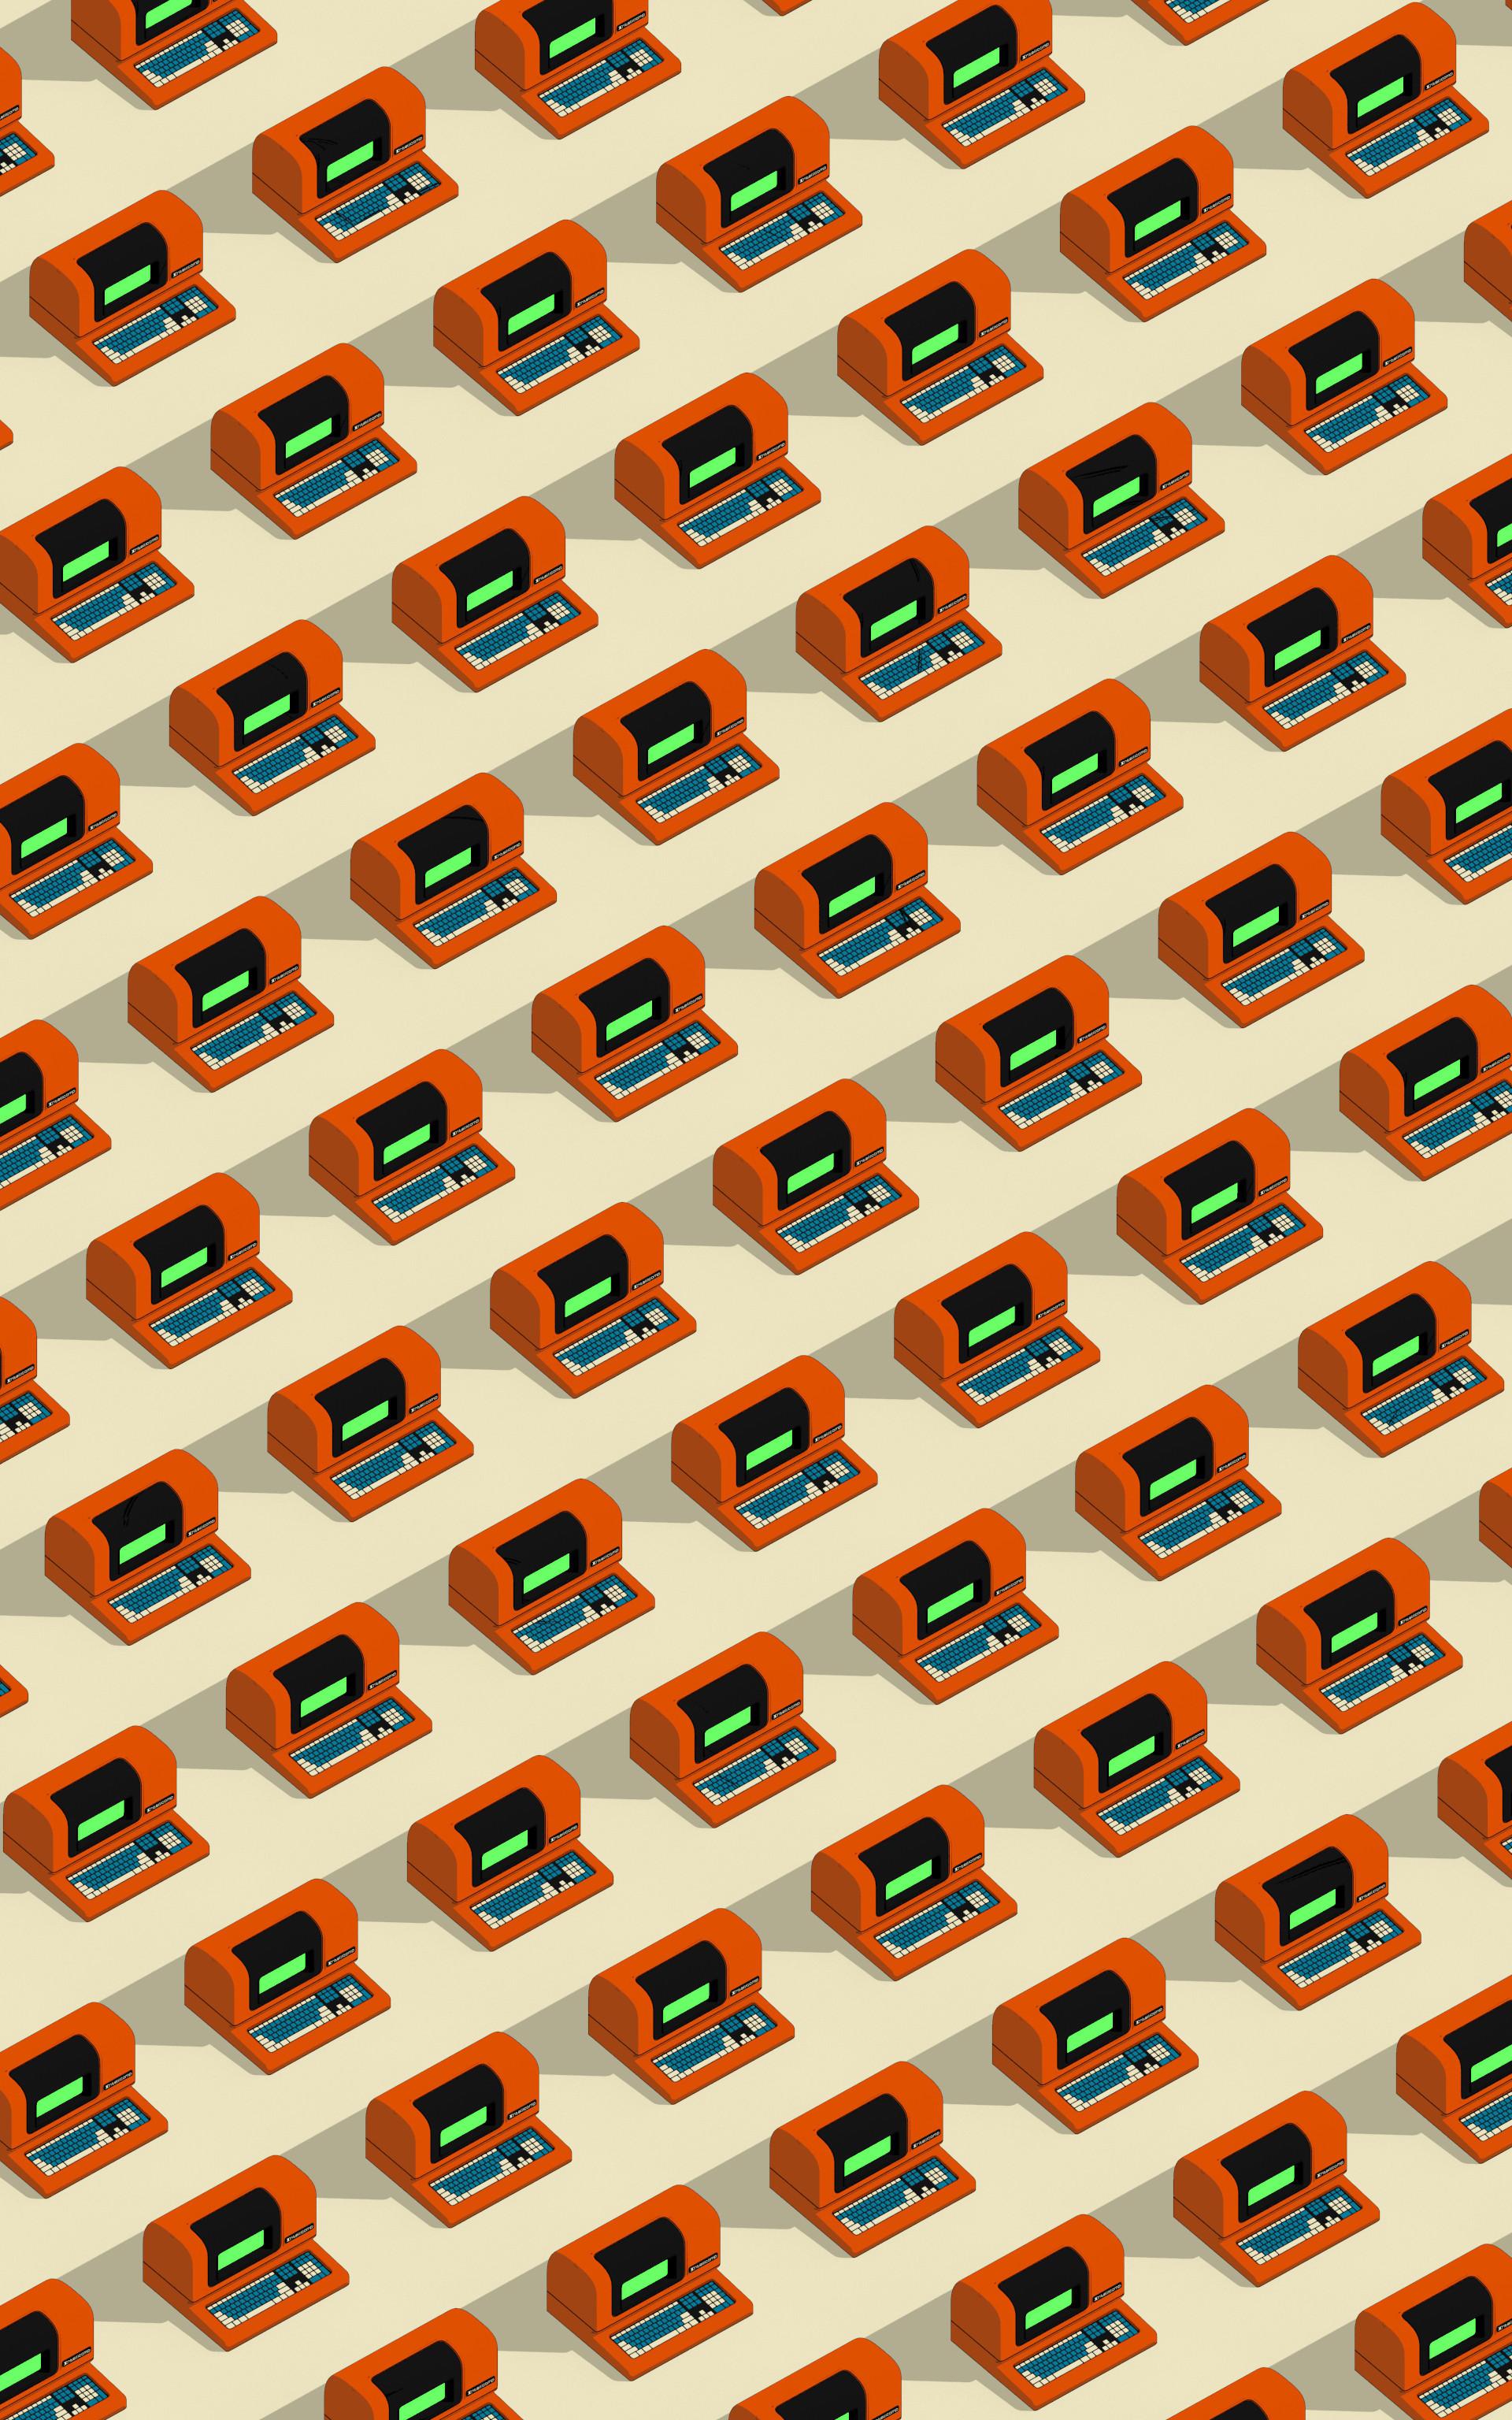 Ben nicholas bennicholas spectrum 005 intellicomp 03